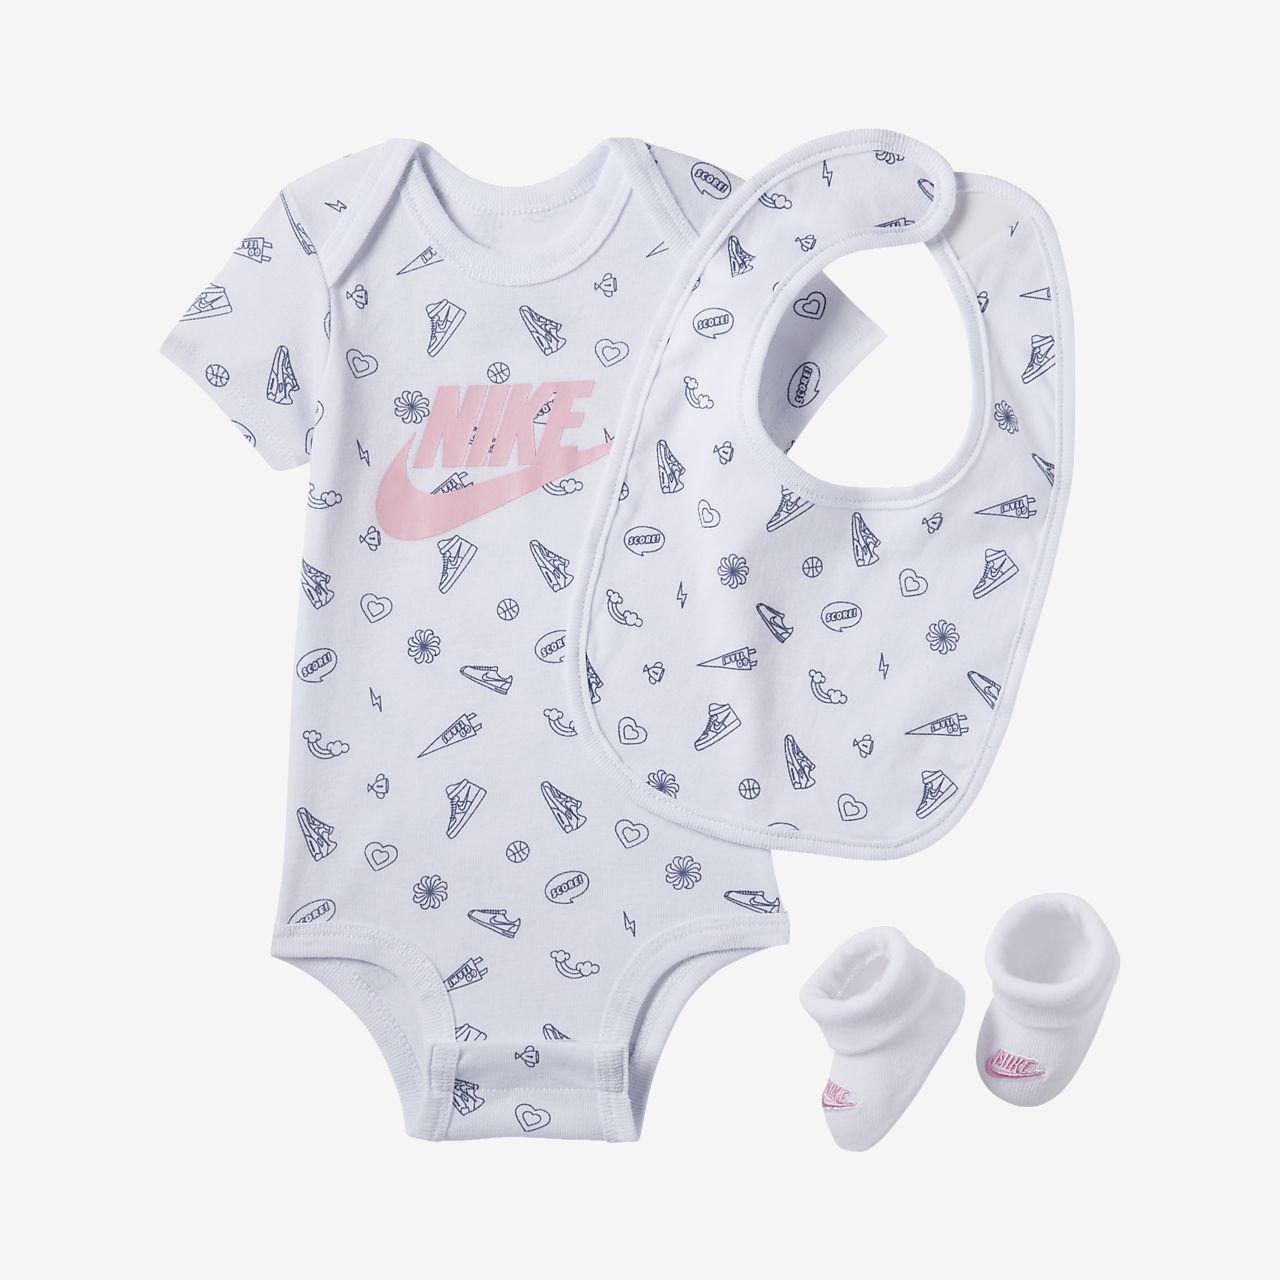 Nike Baby Printed 3-Piece